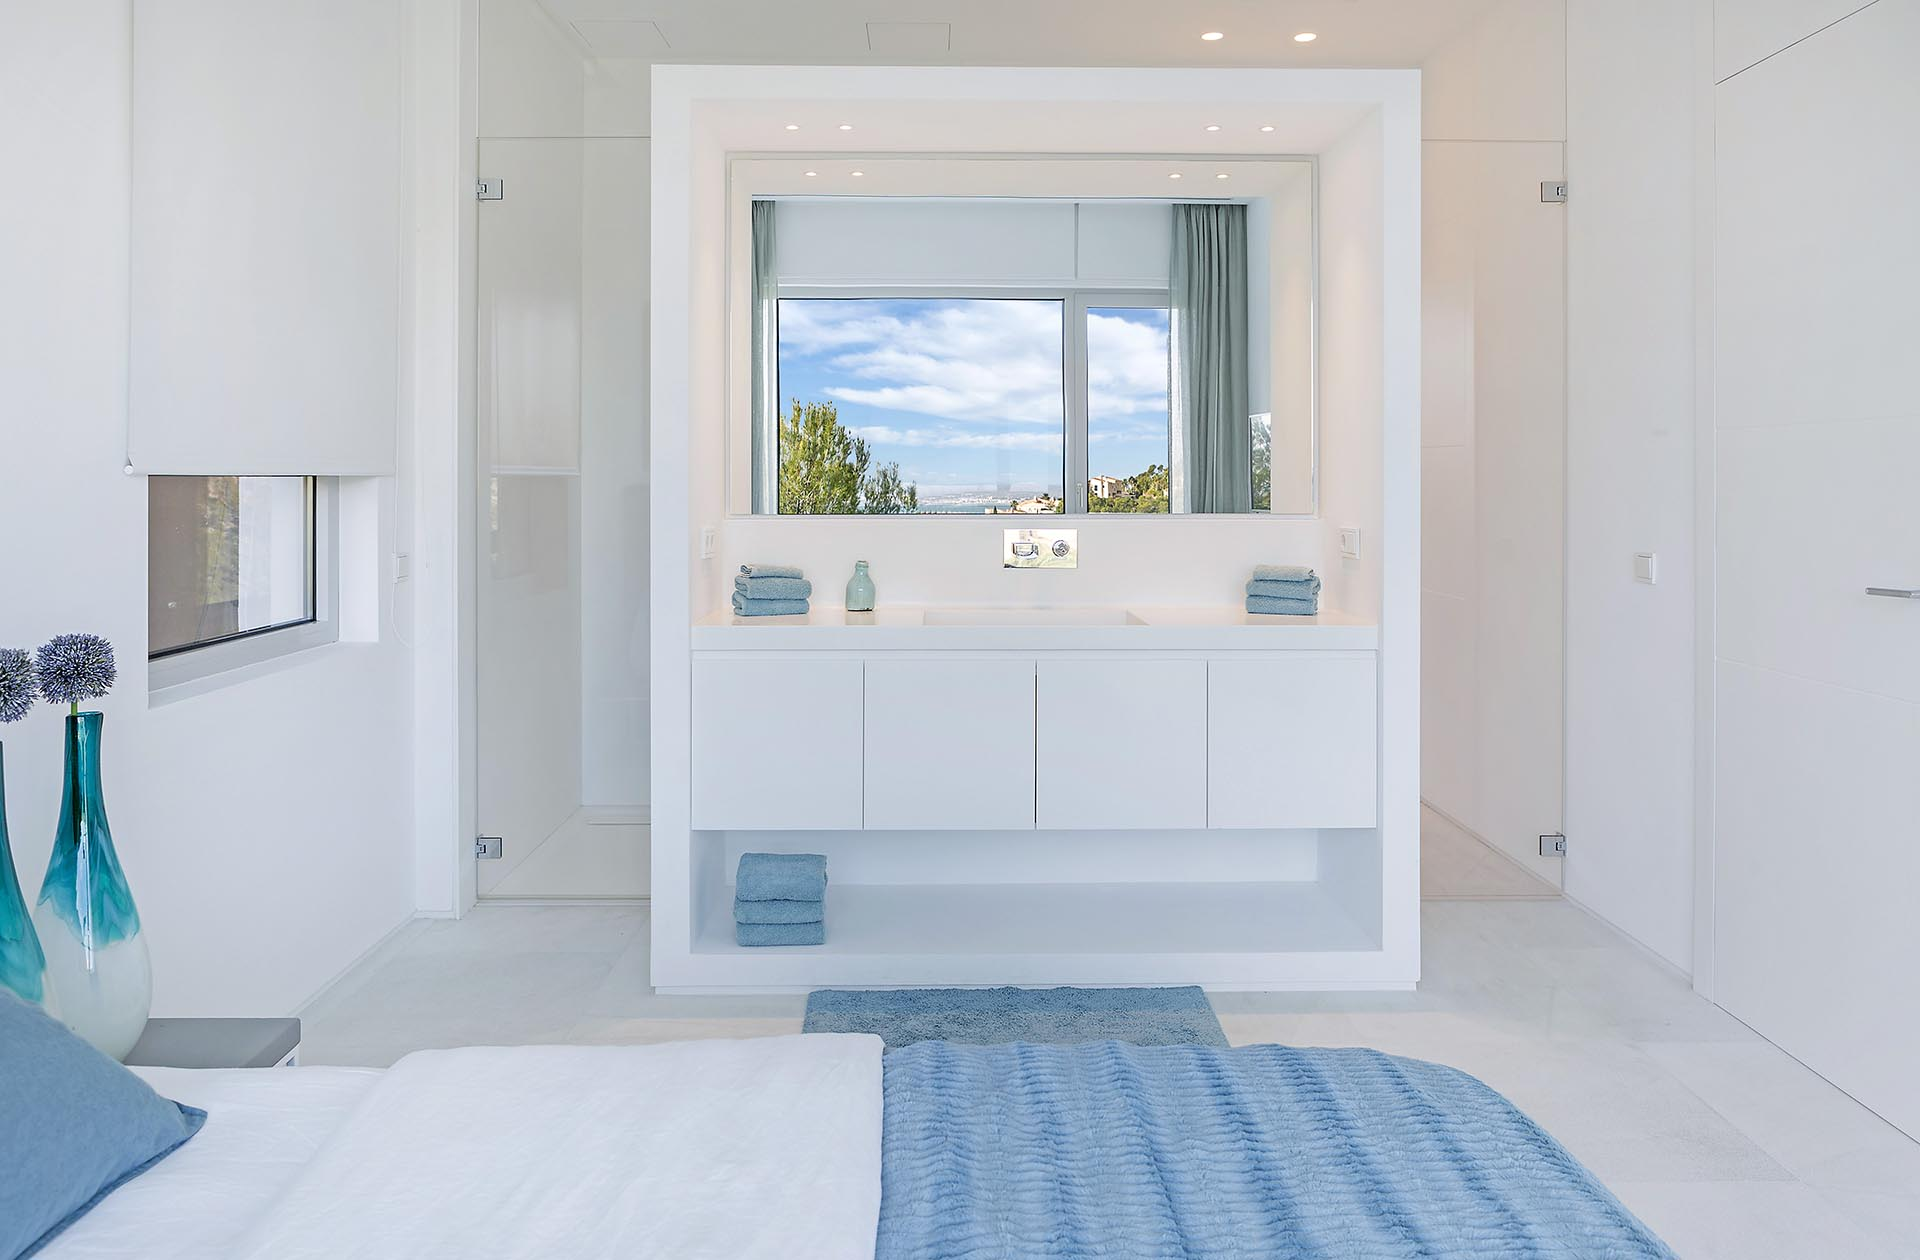 Beautiful modern villa in Costa den Blanes - Bathroom area in the bedroom